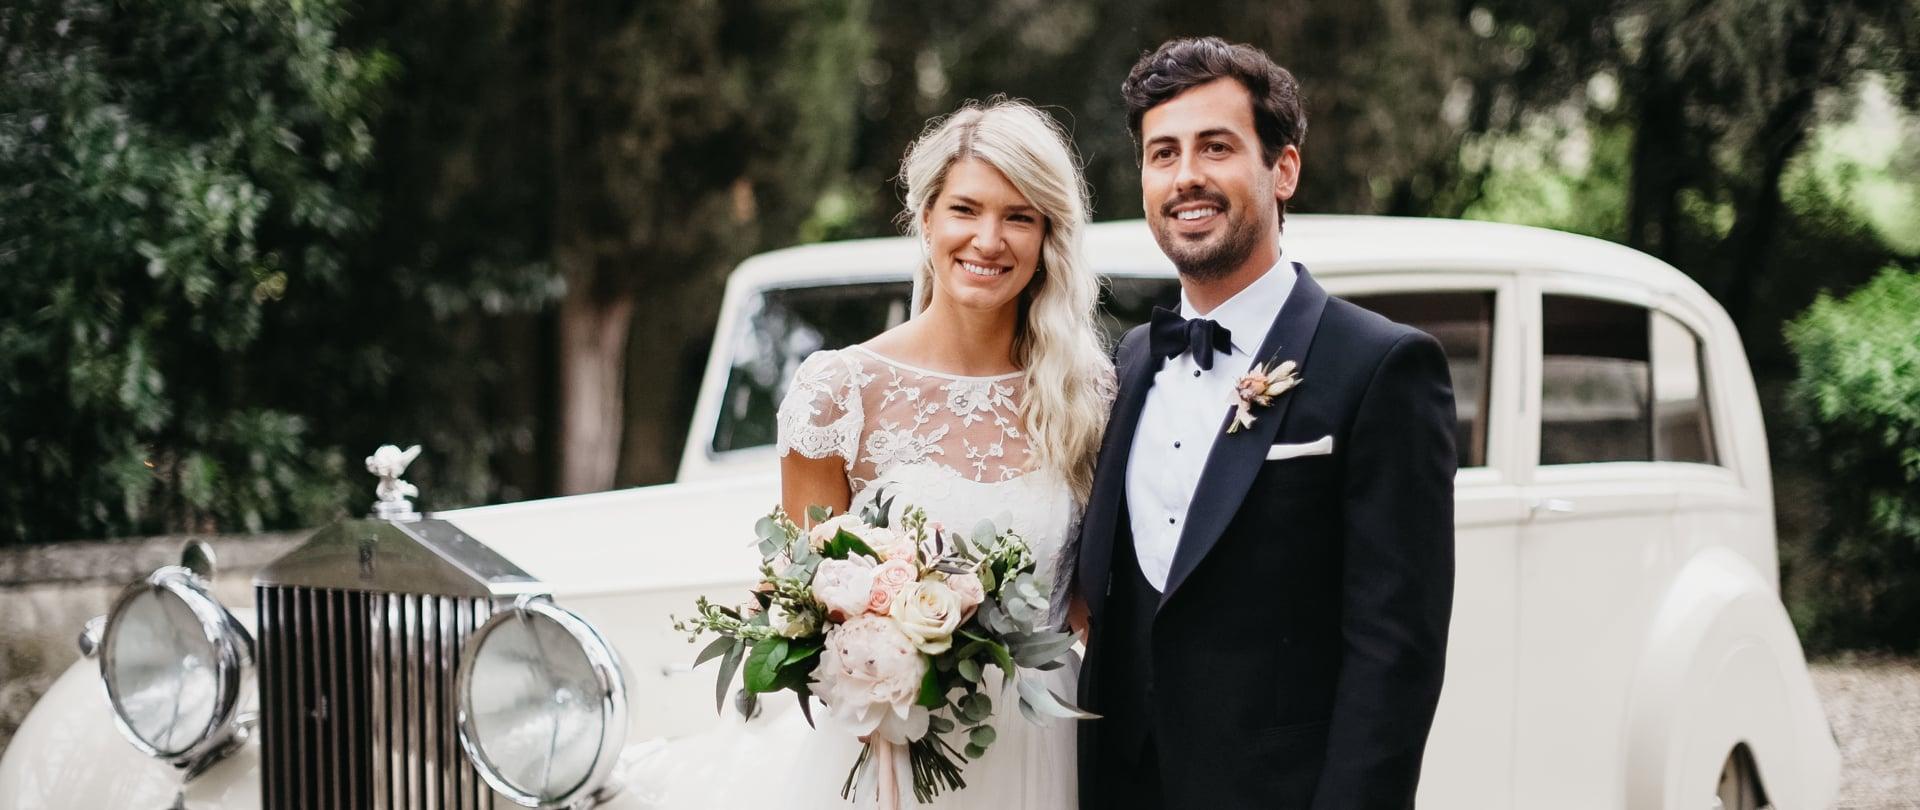 Elise & Nathan Wedding Video Filmed at Tuscany, Italy